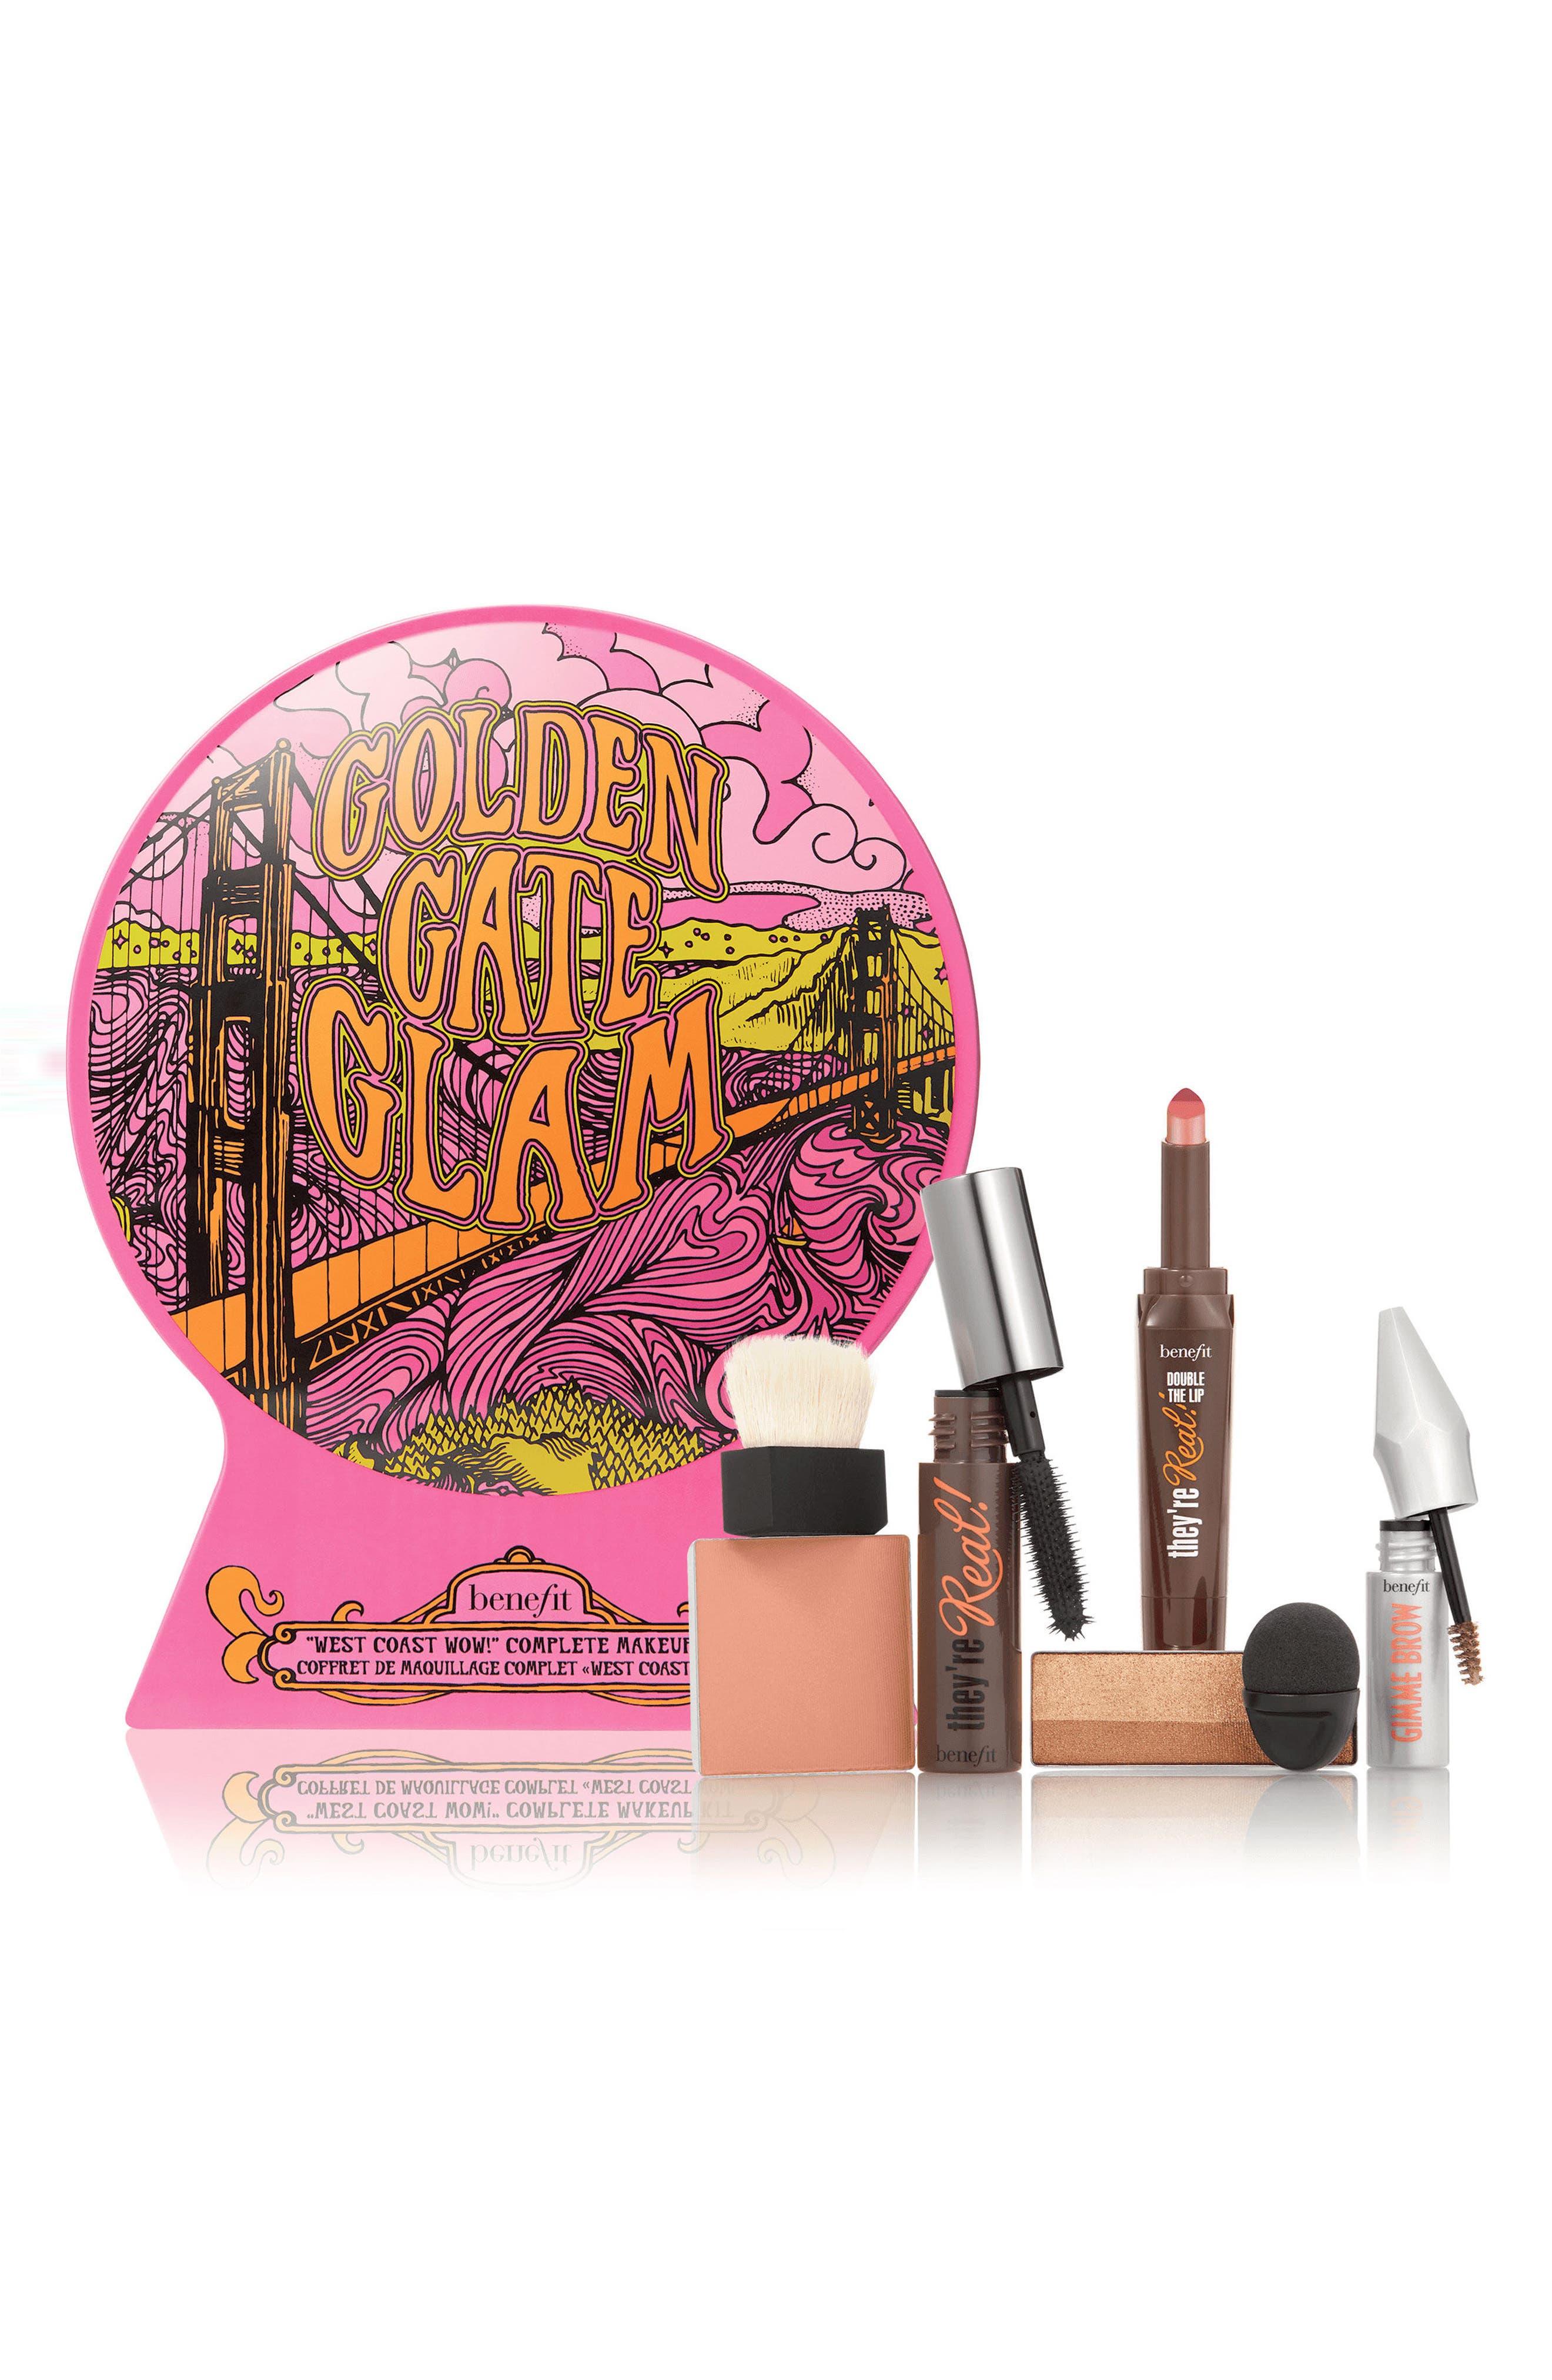 Benefit Golden Gate Glam Complete Makeup Kit,                             Main thumbnail 1, color,                             000